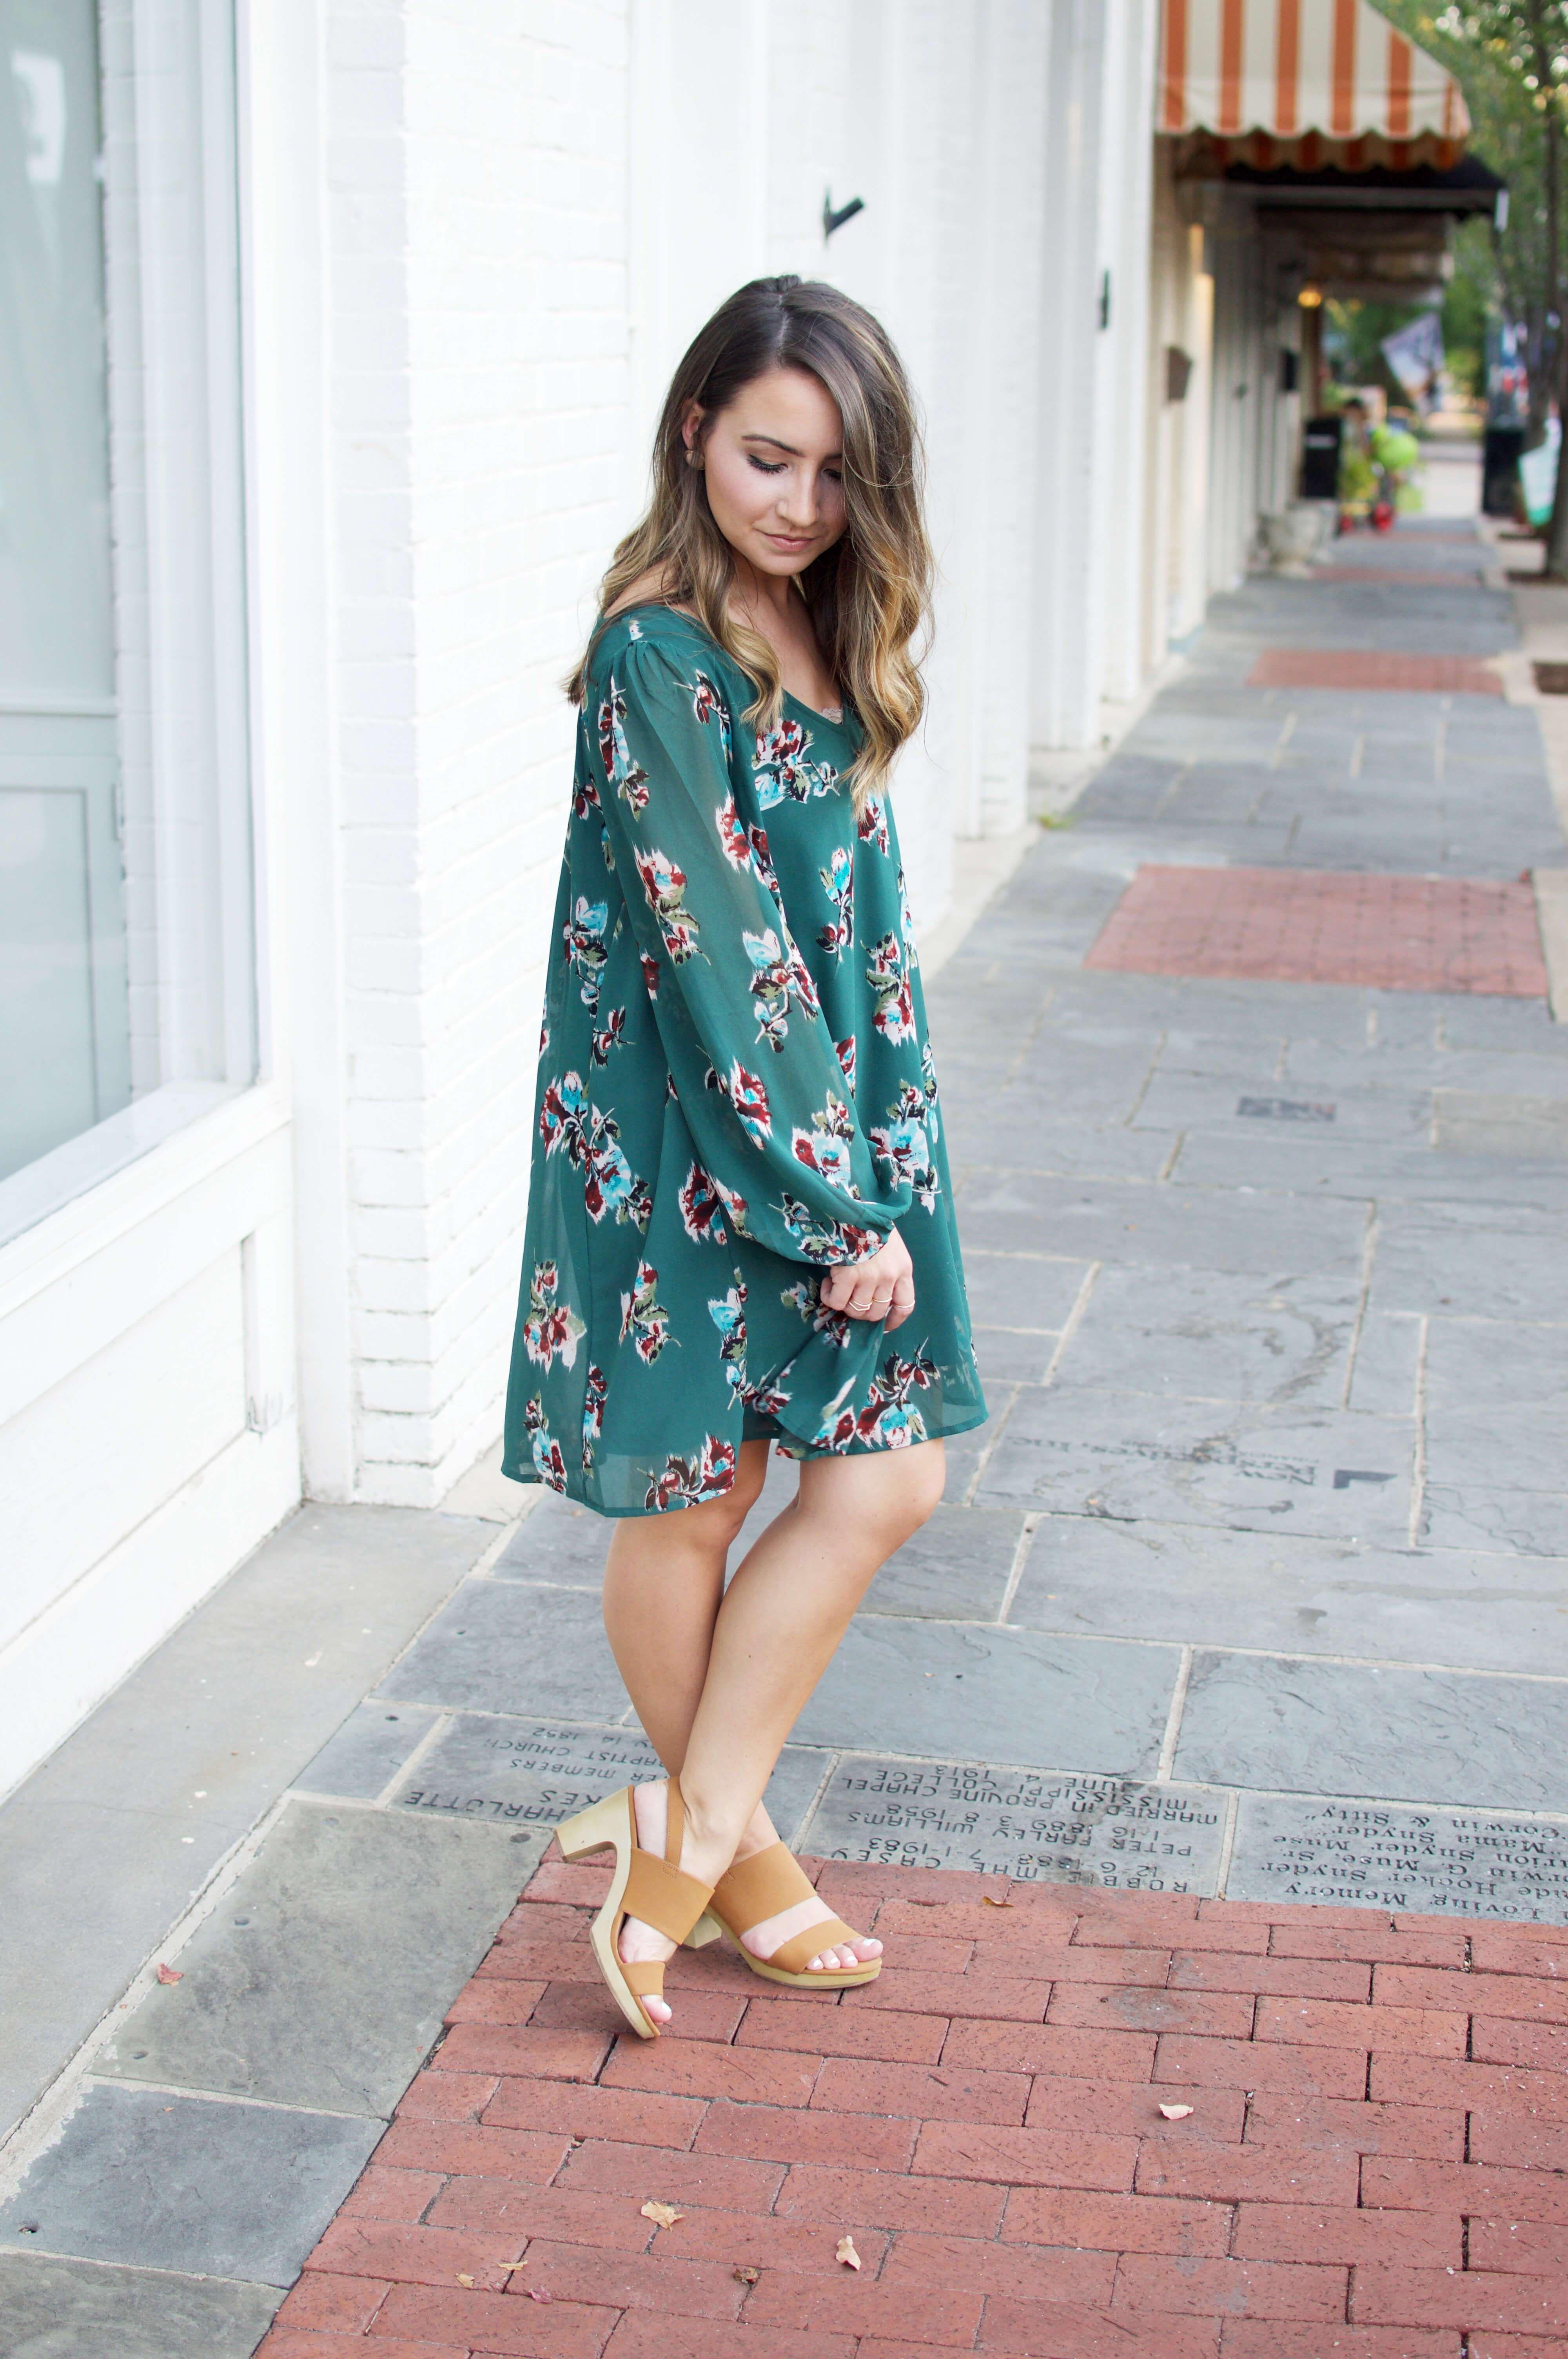 Graduate londons fashion week winners, Night to Class Out: Geometric Print Dress